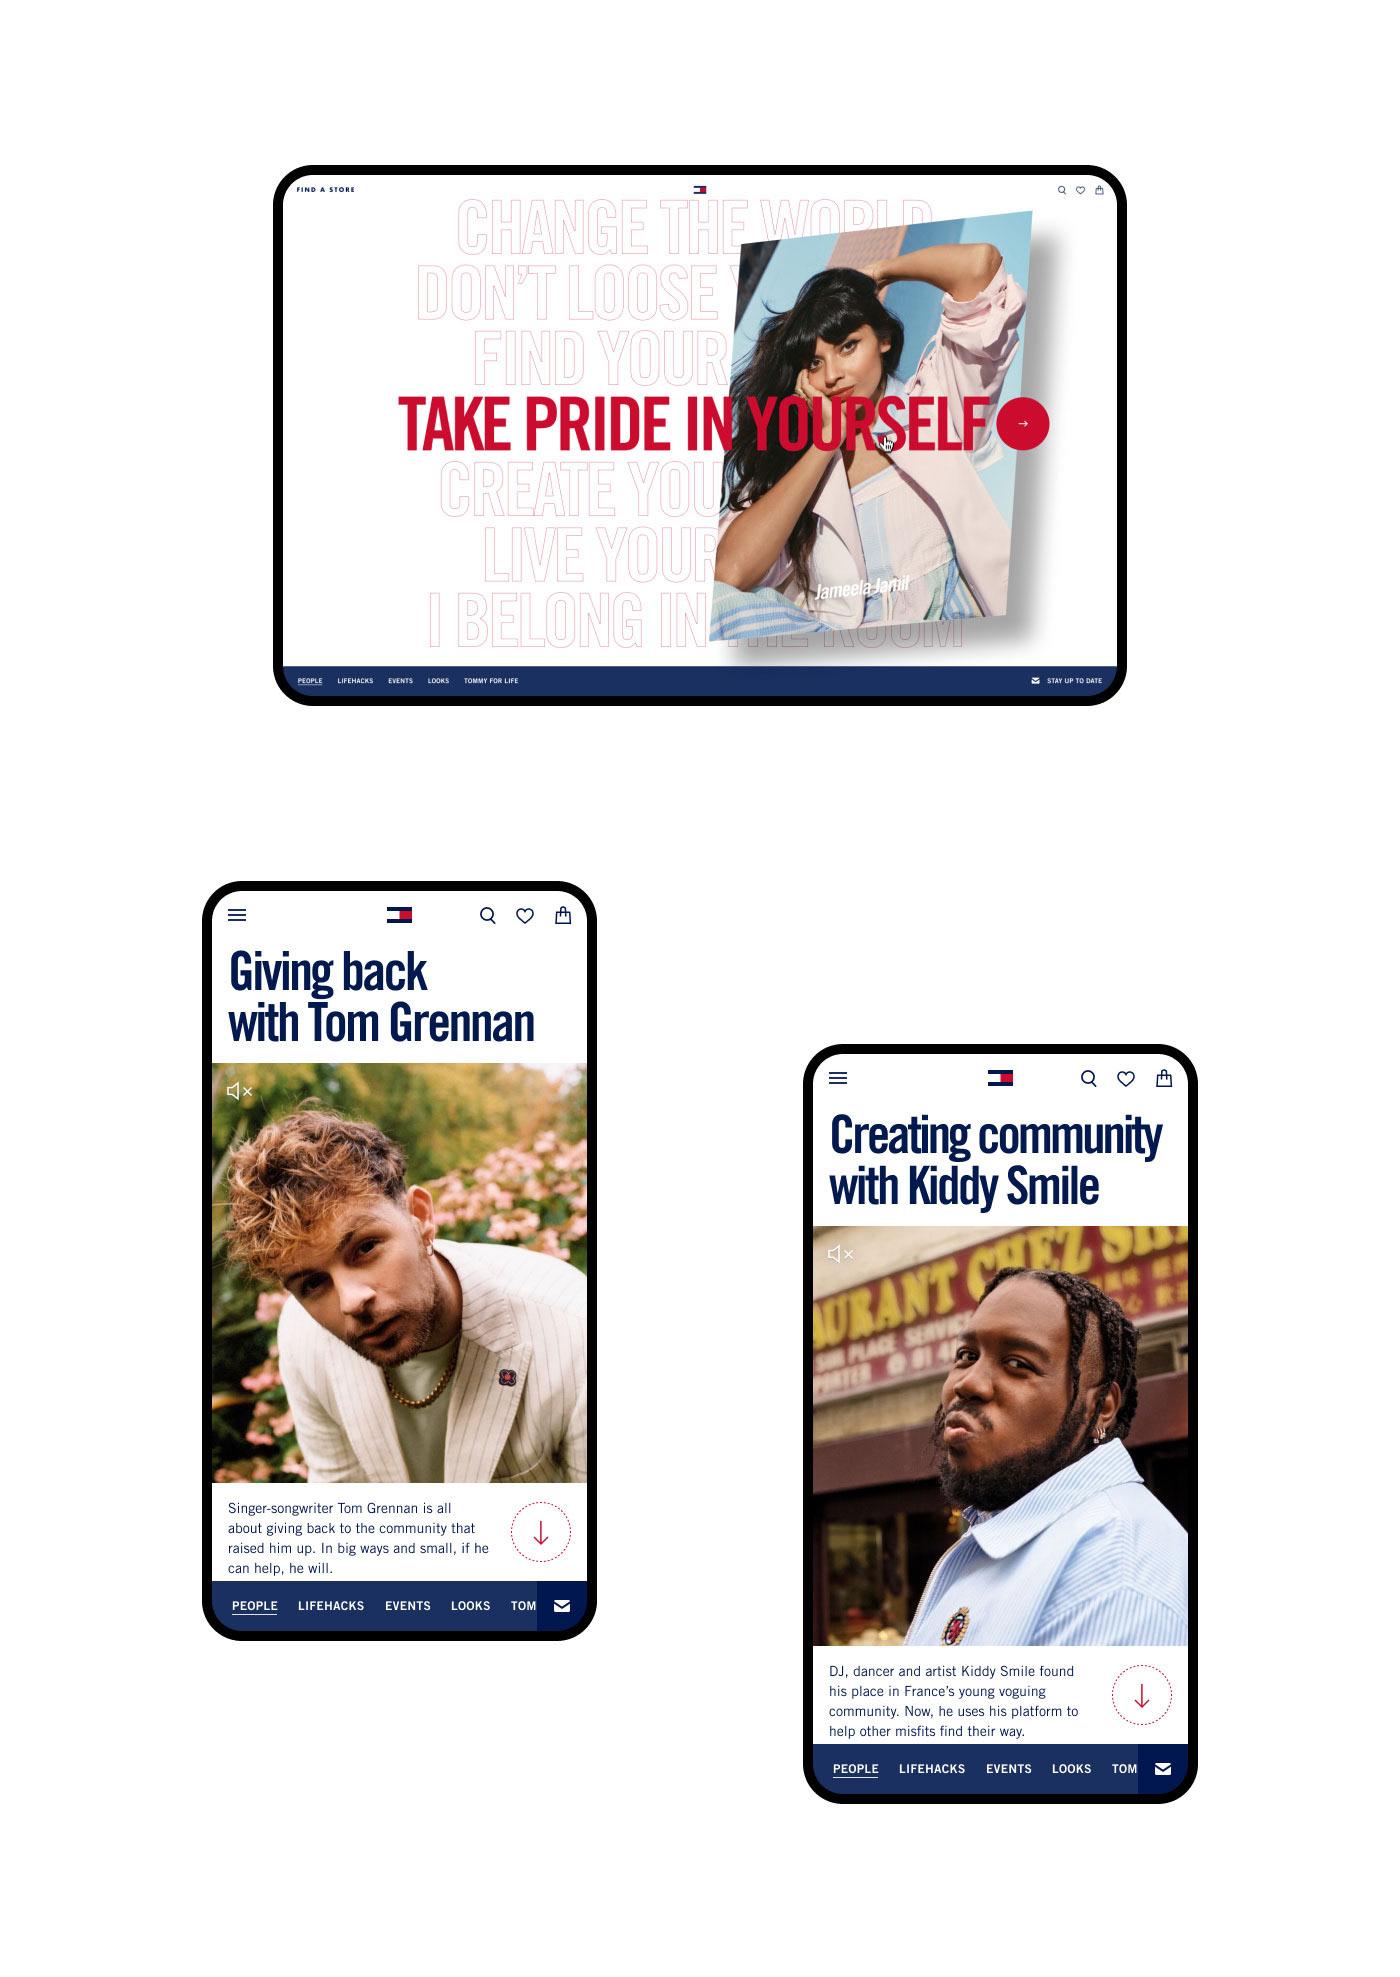 Campaign website designs for desktop and mobile